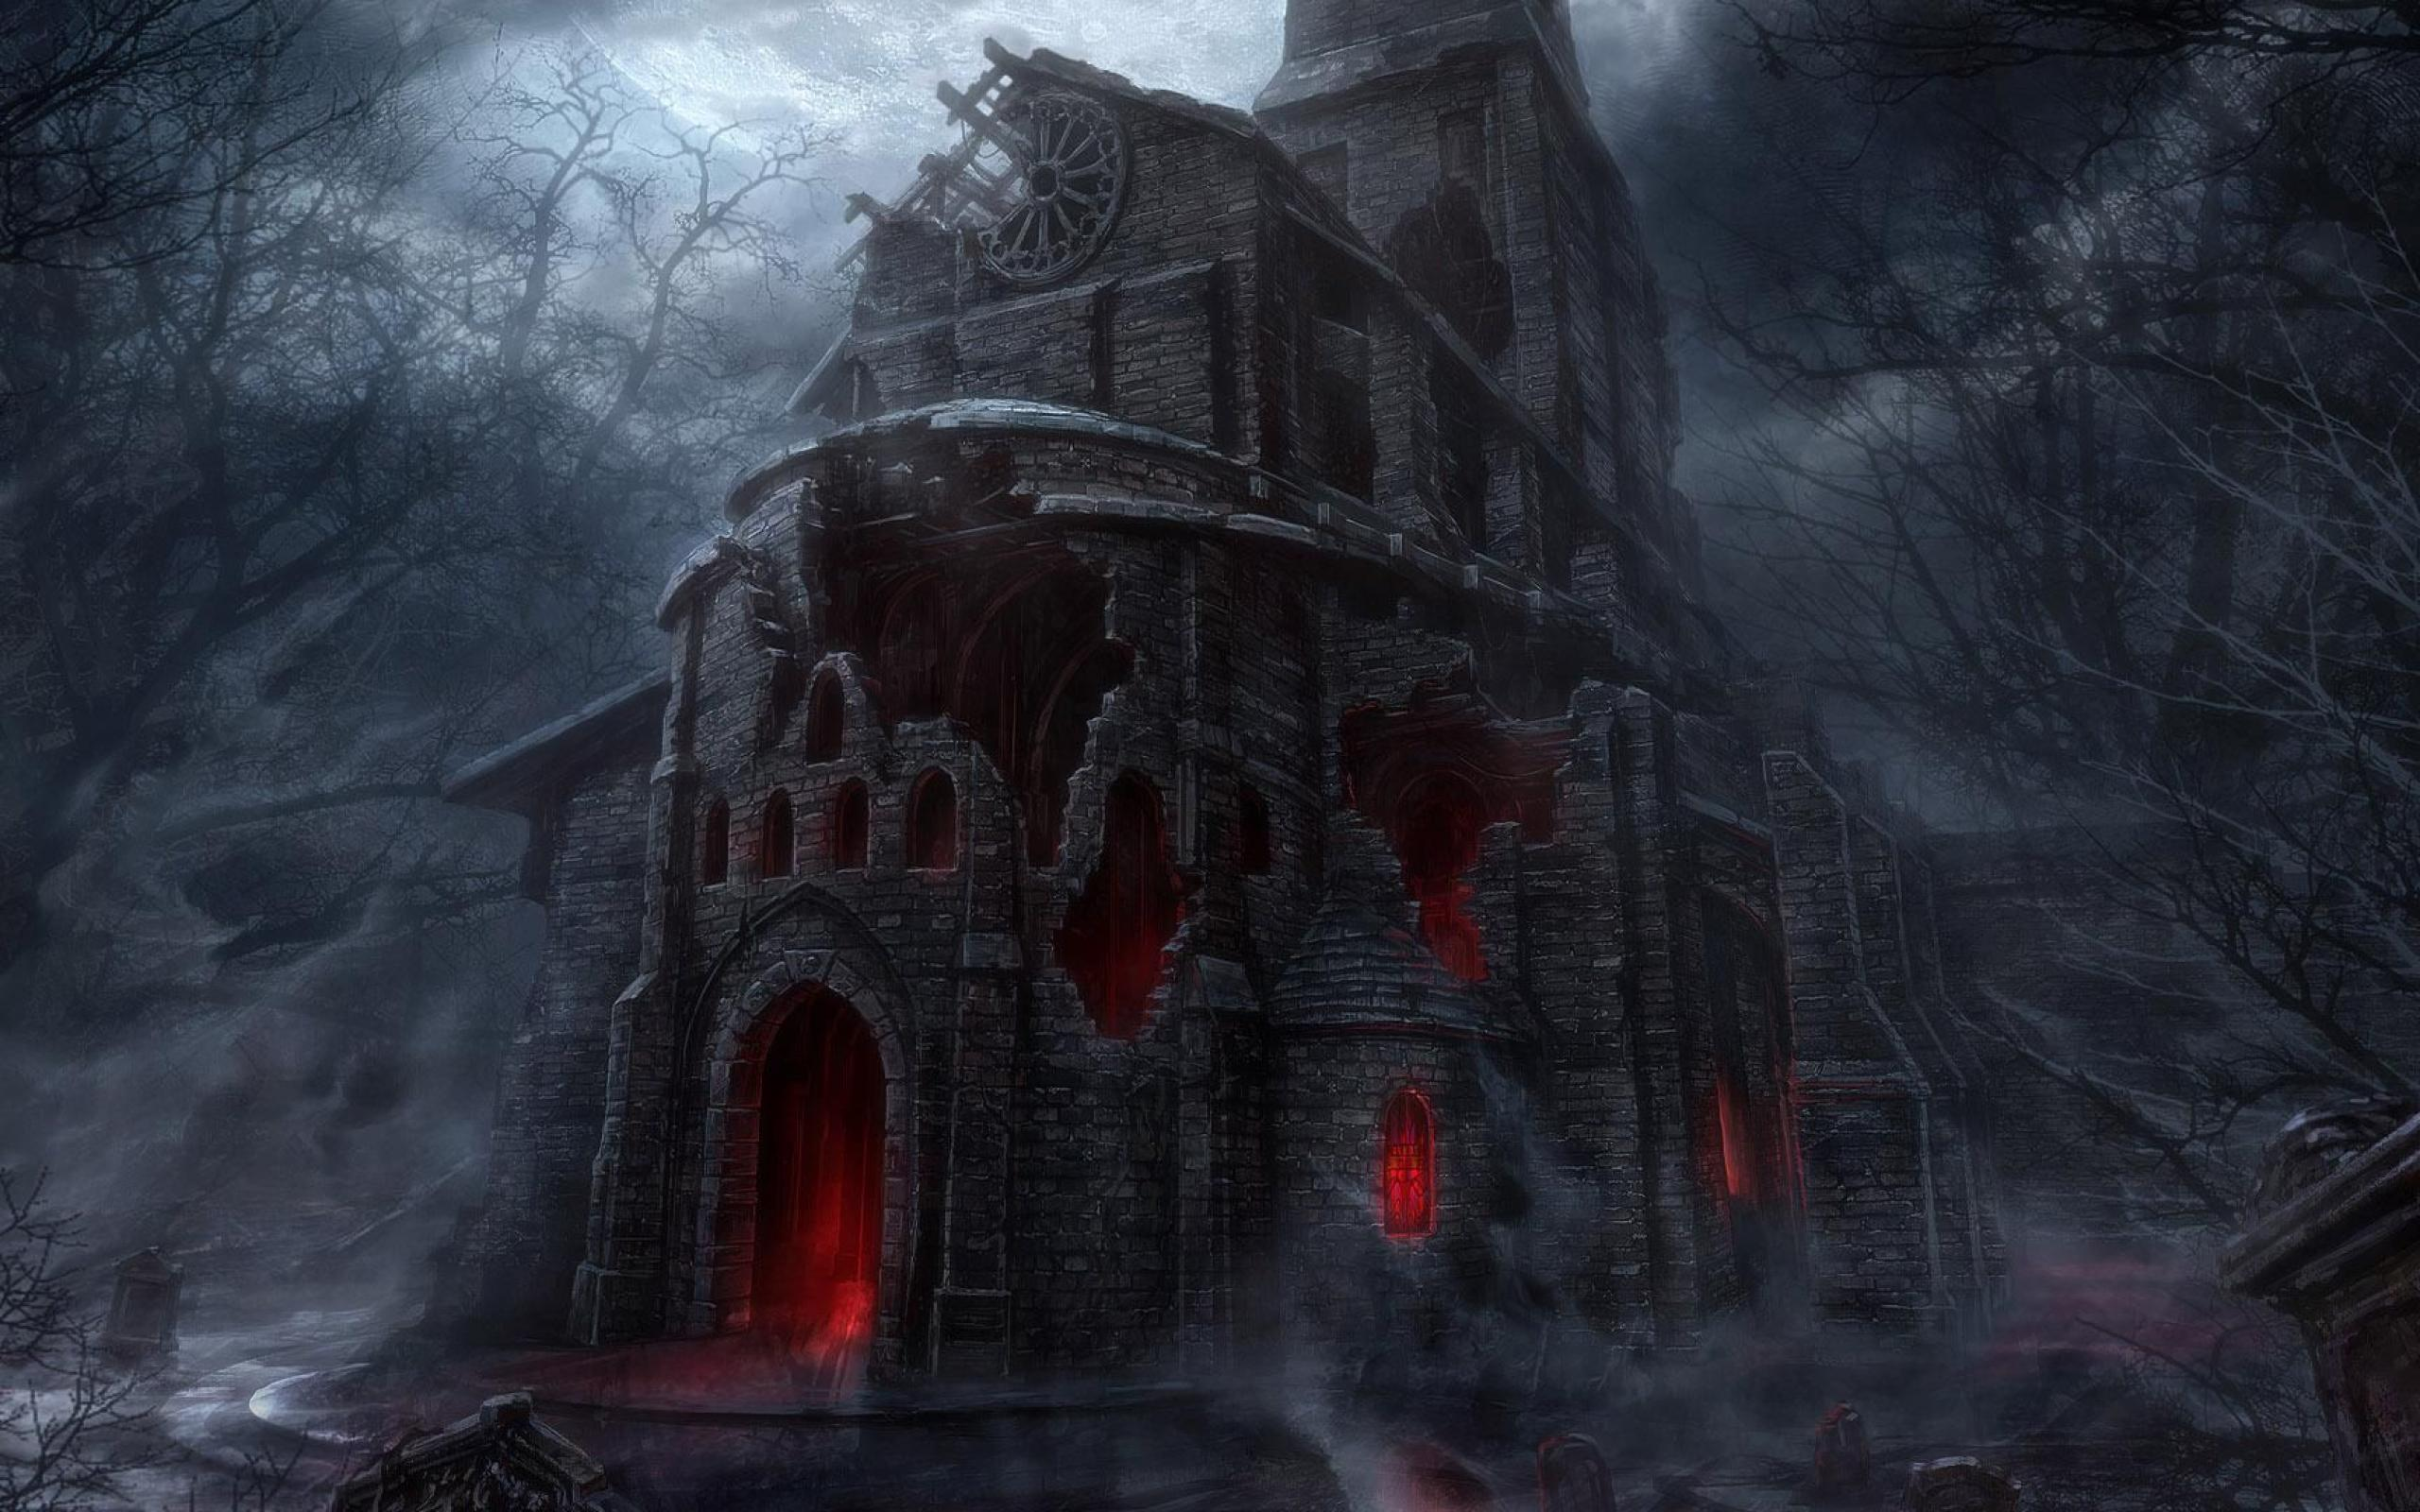 HQ Horror Background 2560x1600 2560x1600